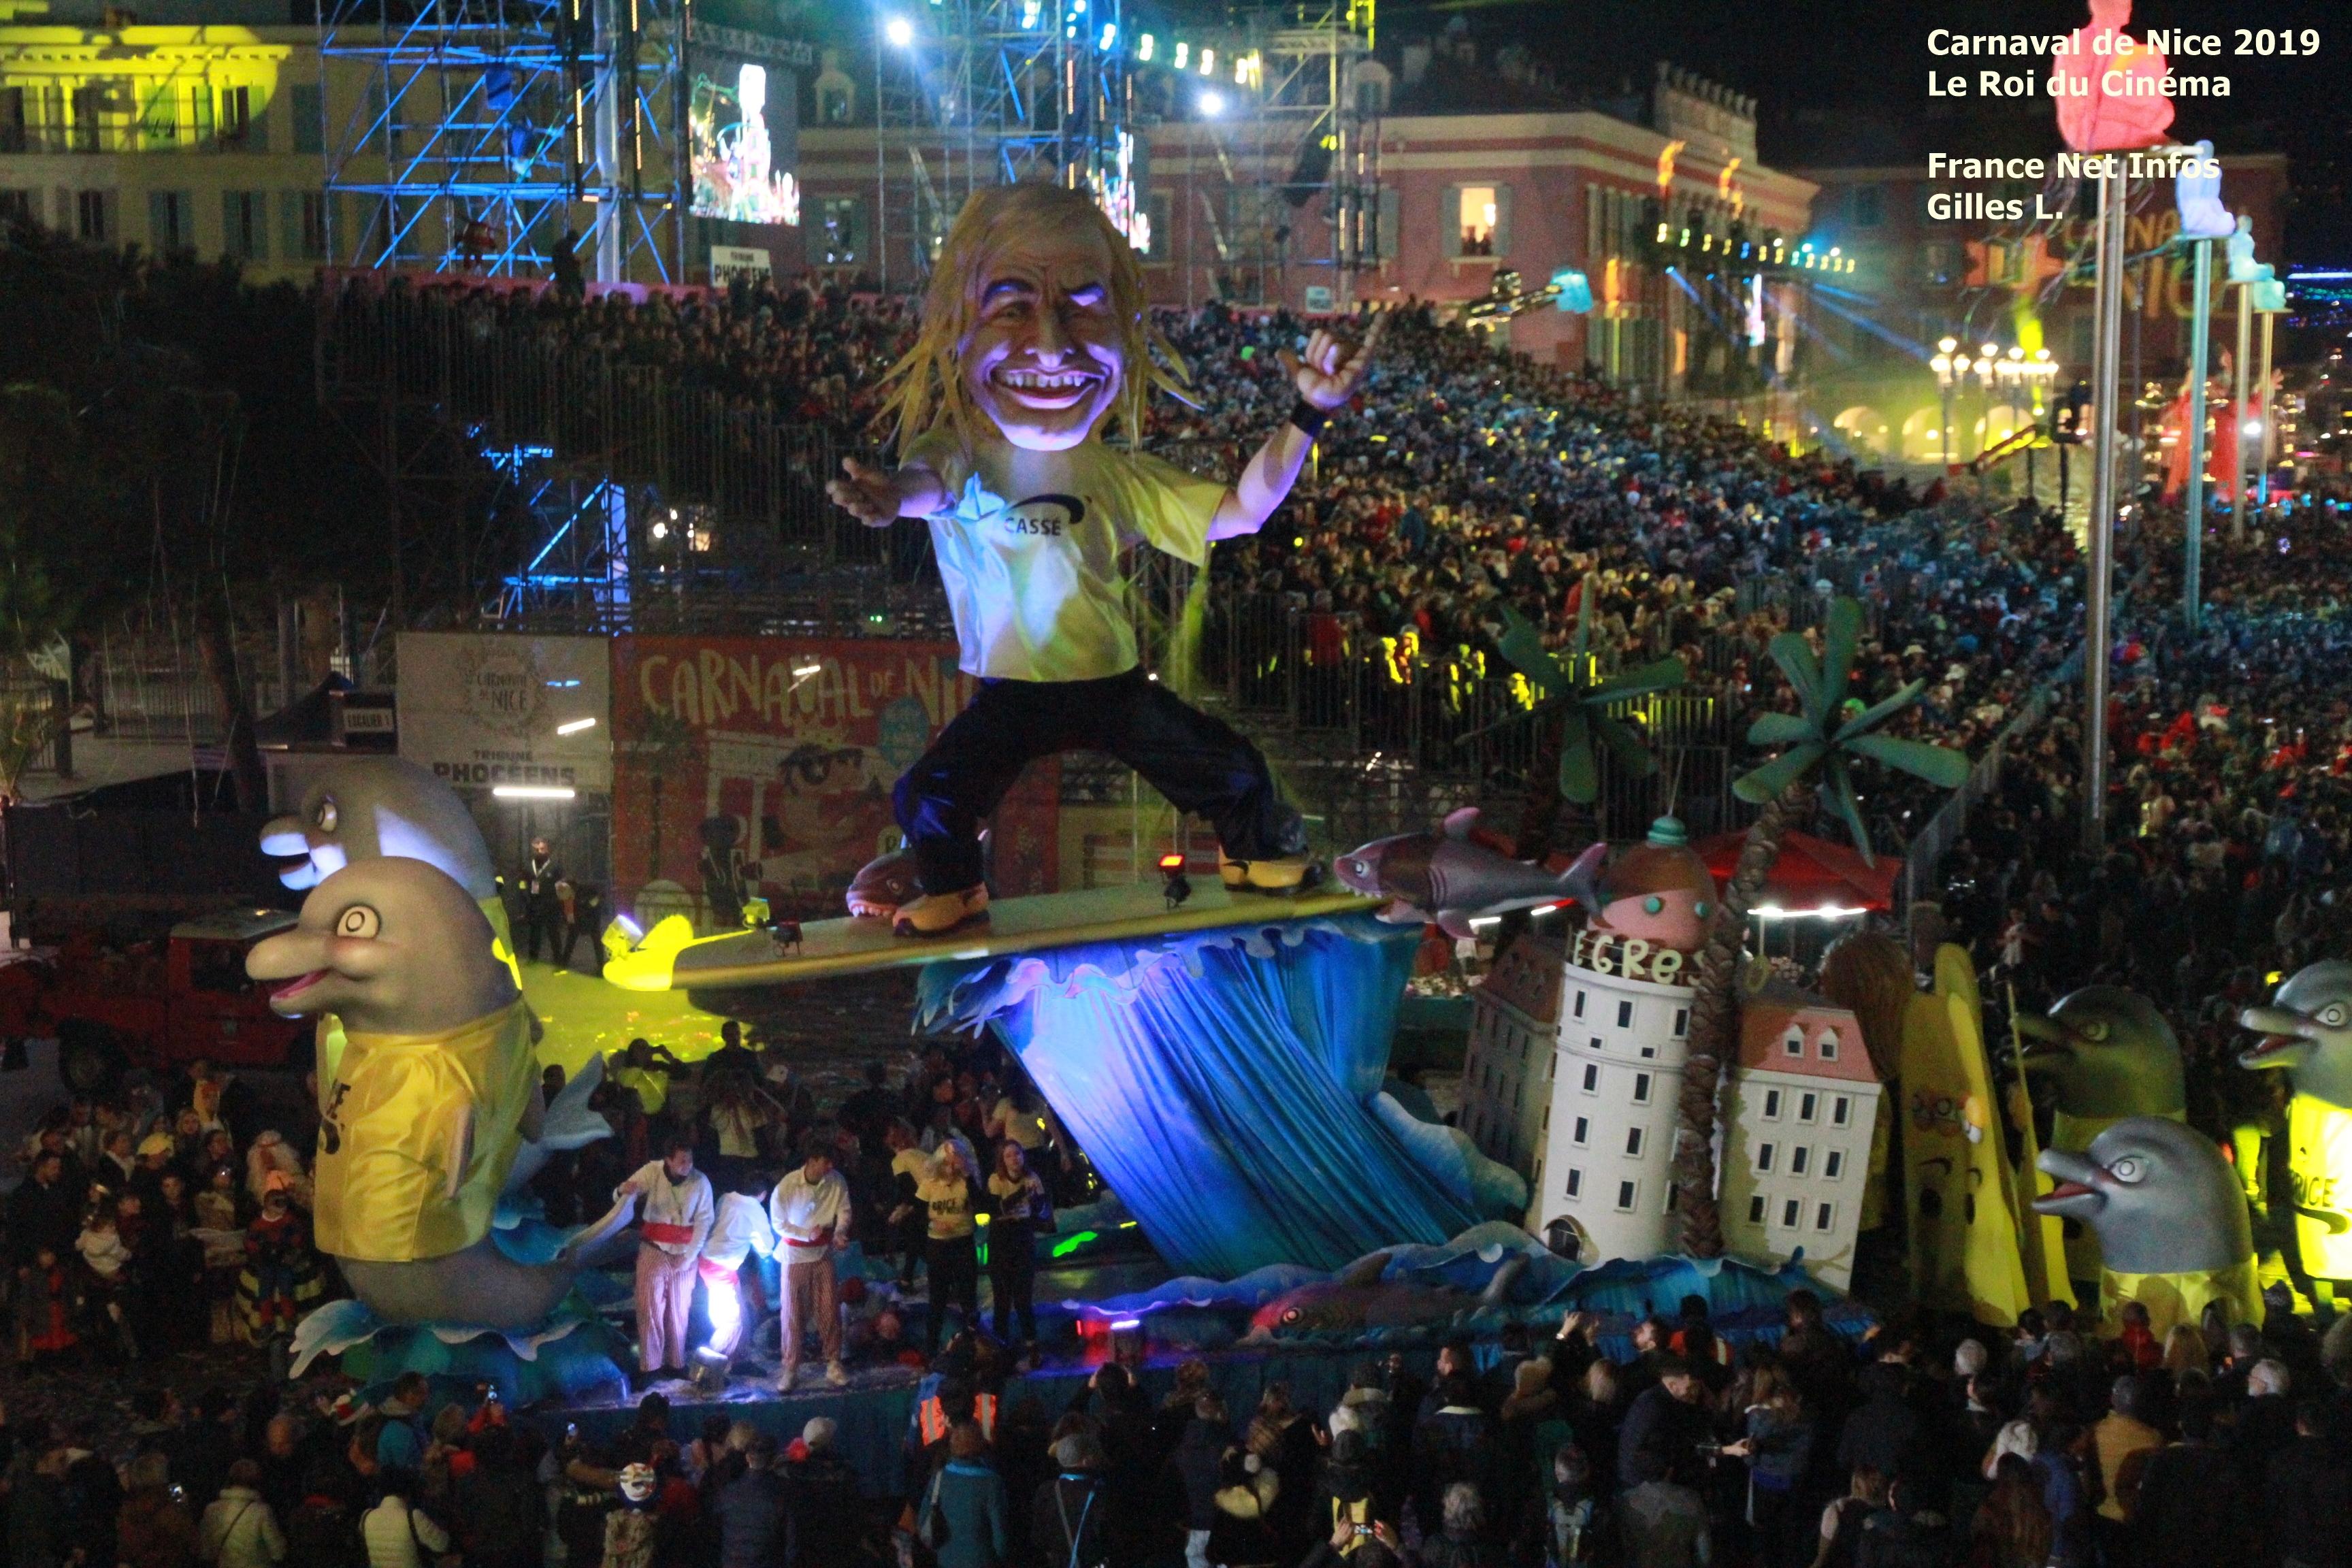 Carnaval Nice 2019.jpeg0626